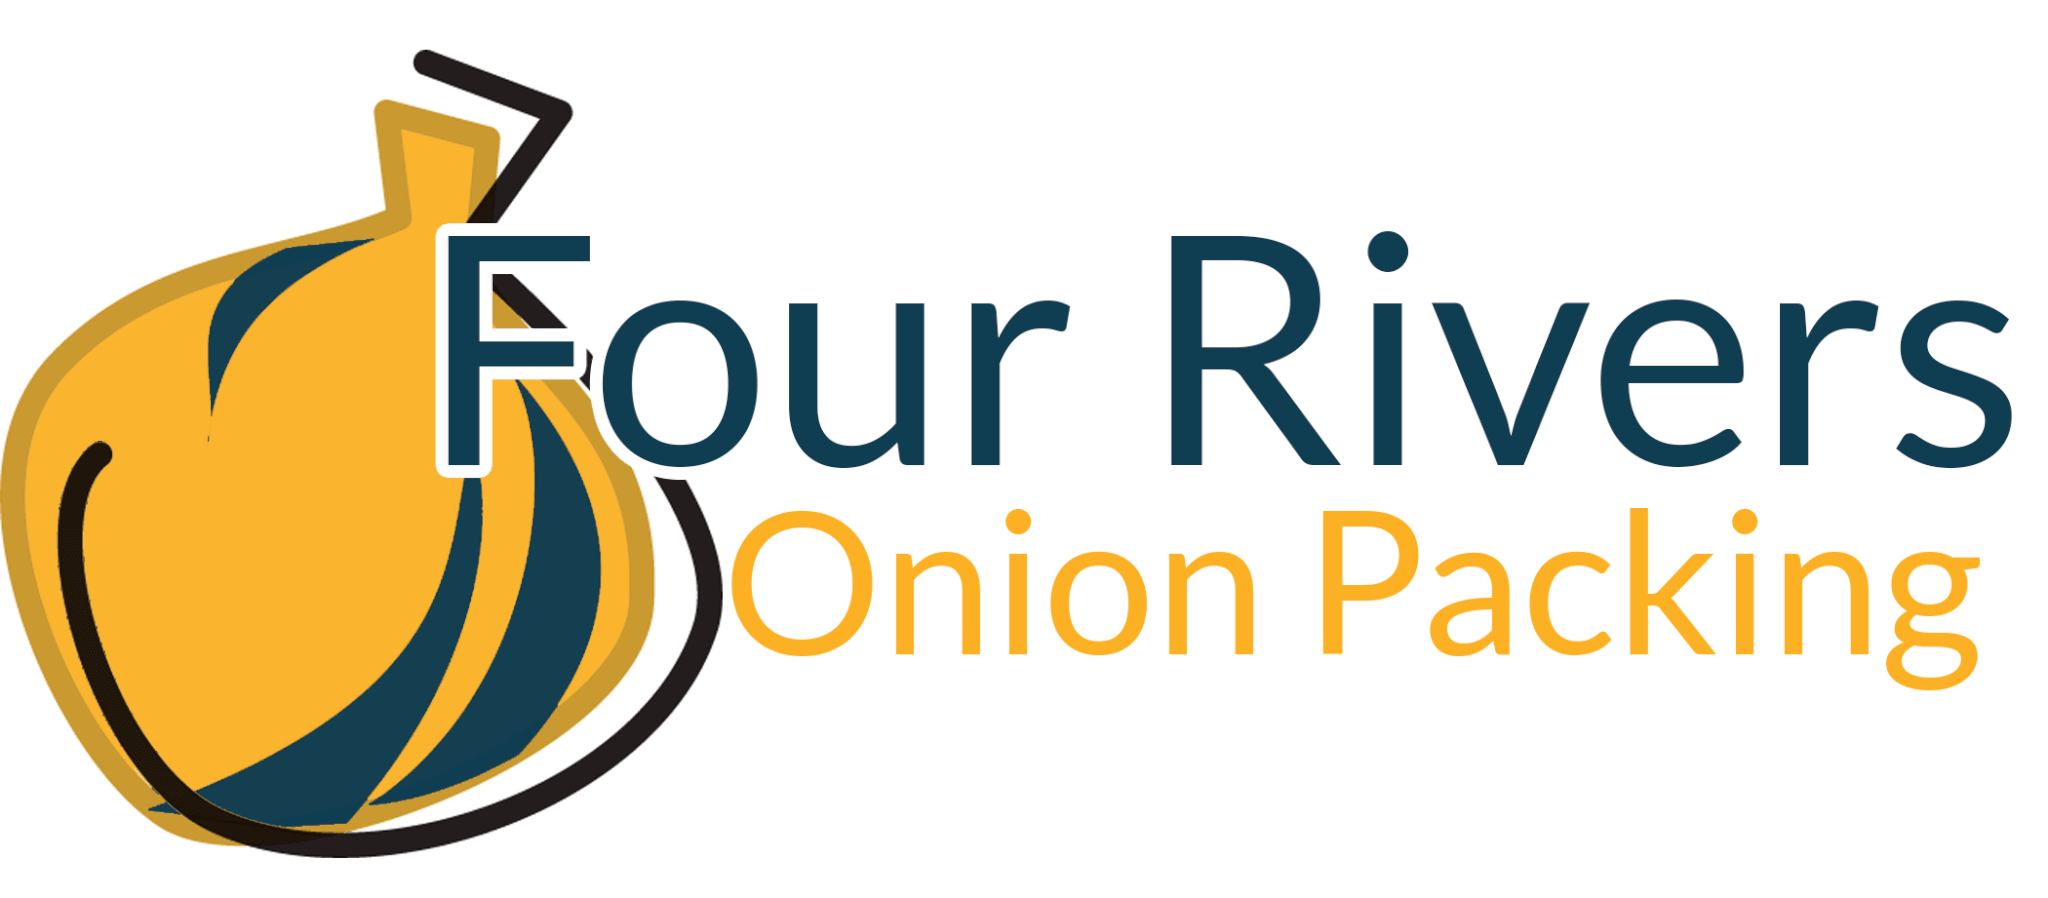 Four River Onion Logo